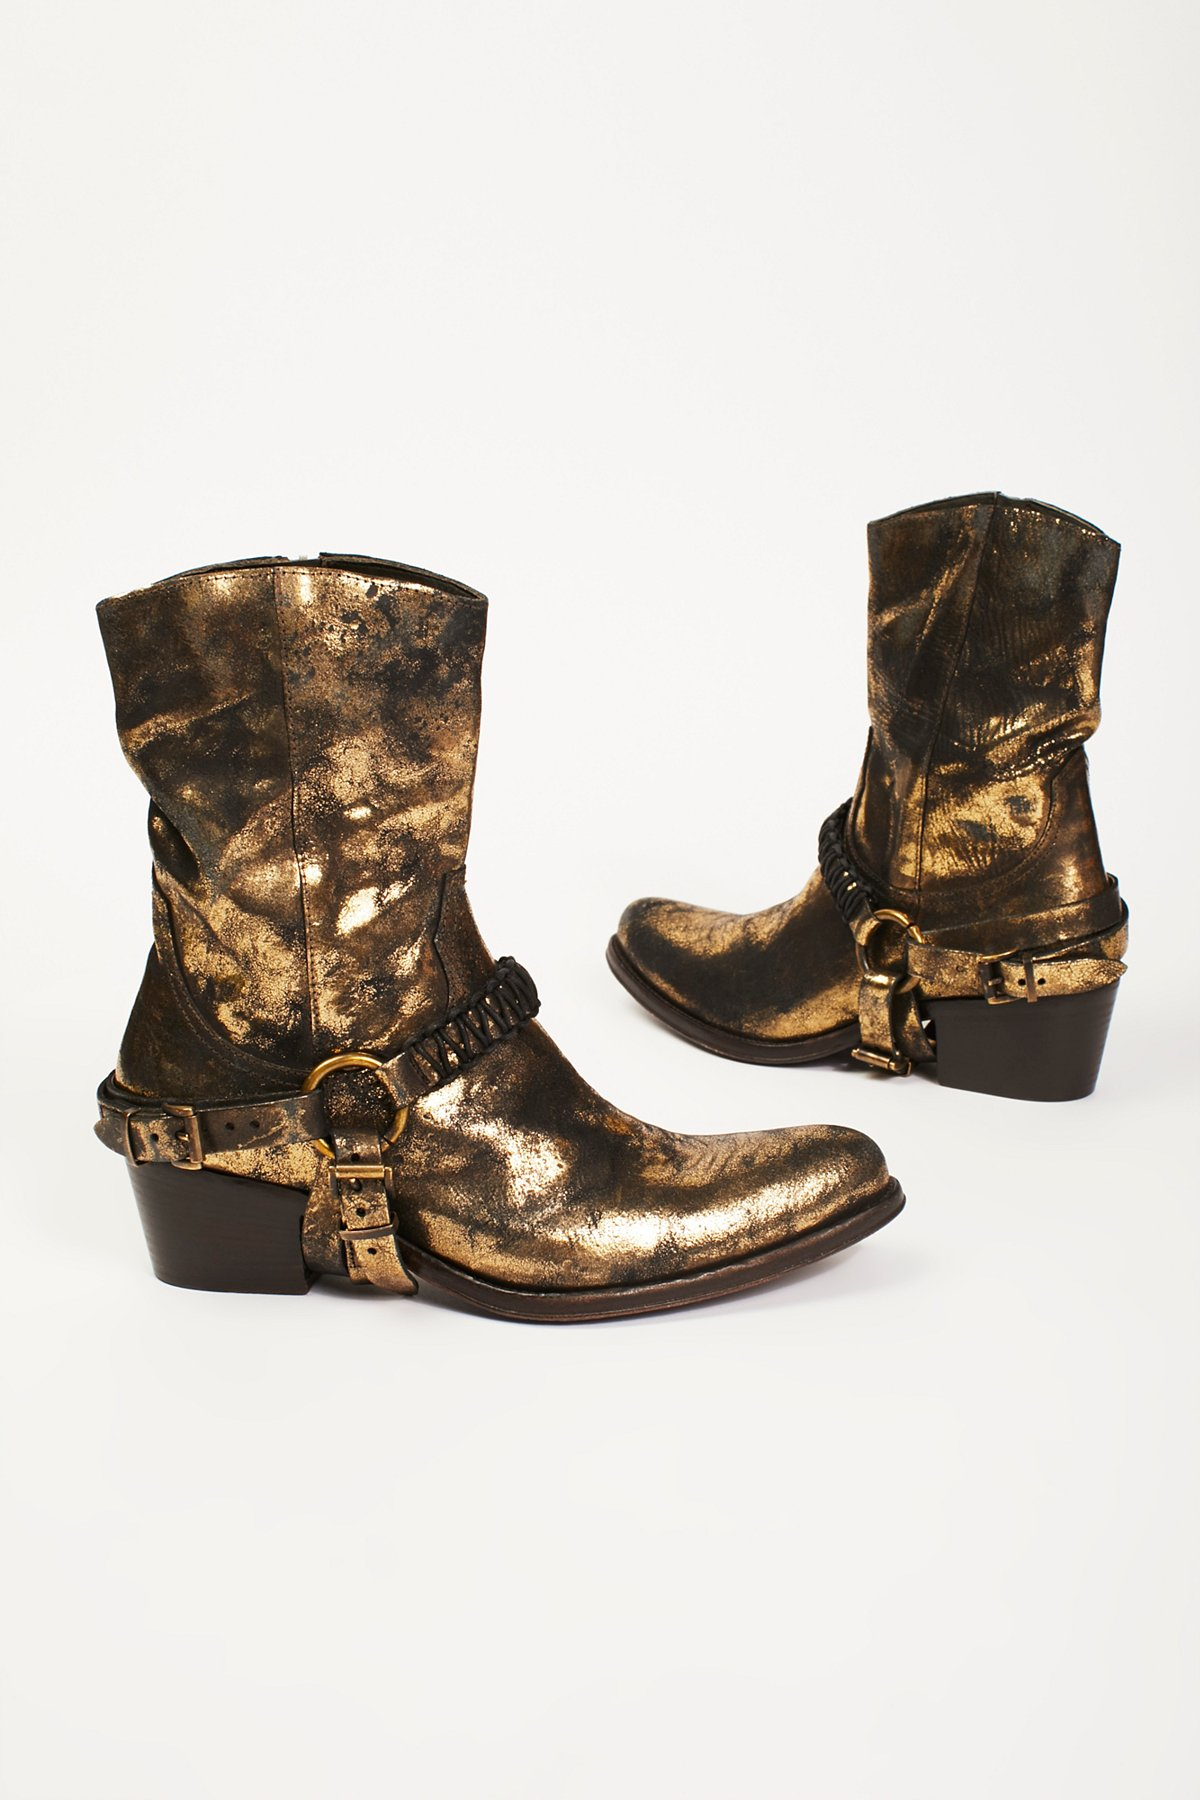 Souvenir西部靴